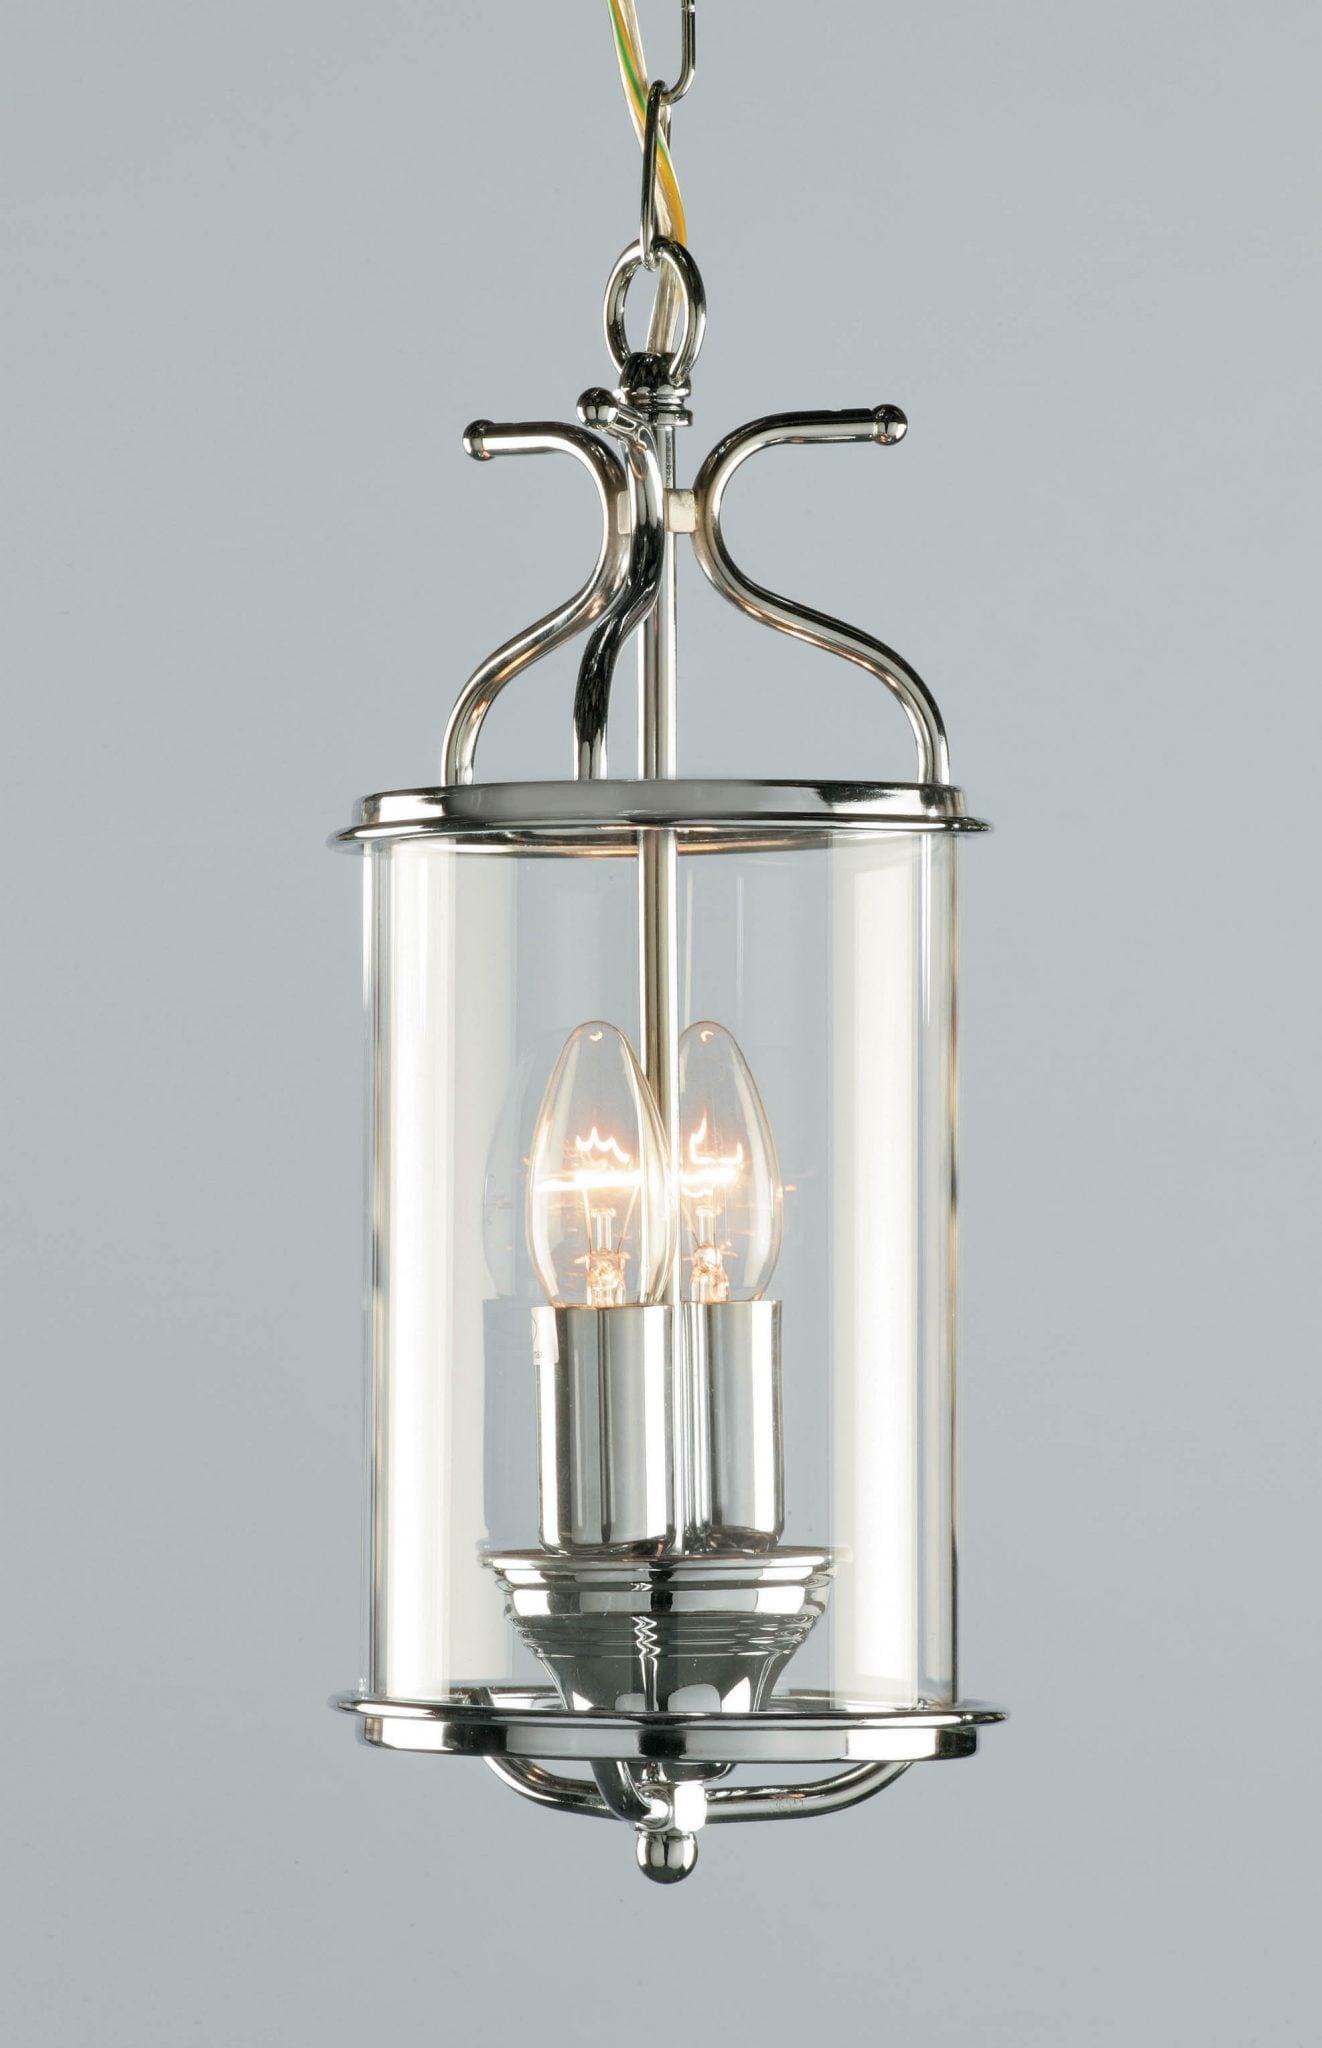 Impex LG00029/CH Winchester 2 light Lantern, Chrome